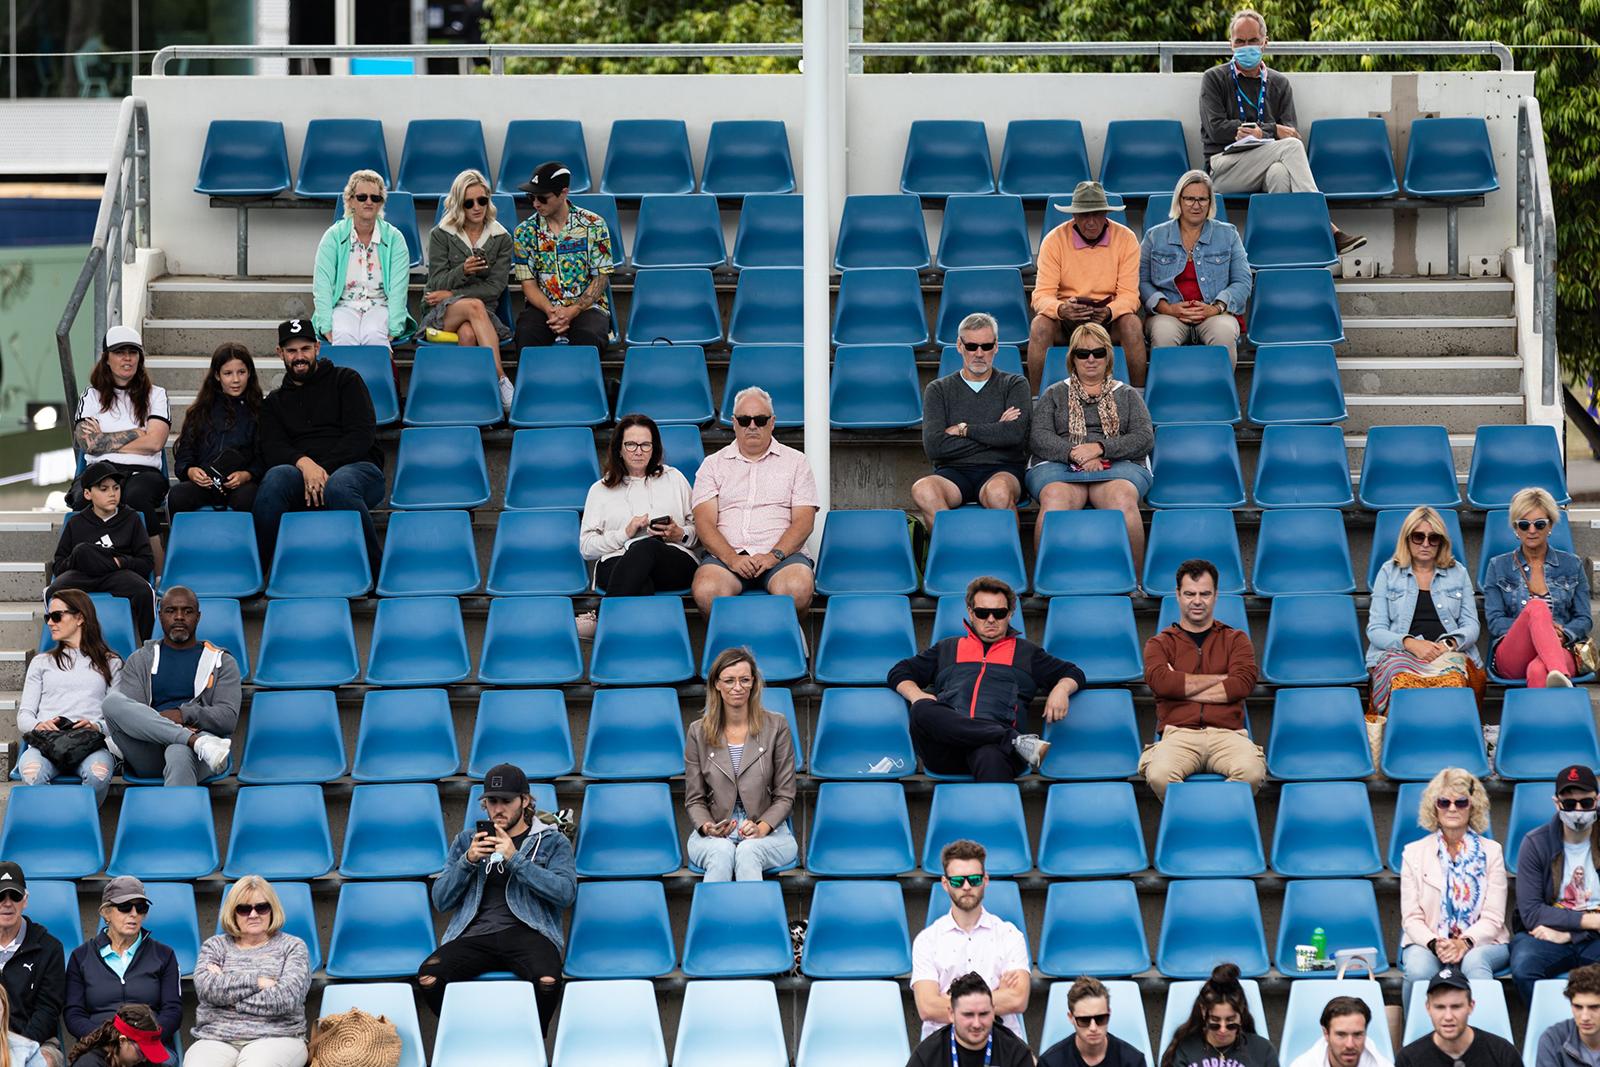 Socially distanced spectators watch a match on Court 3.